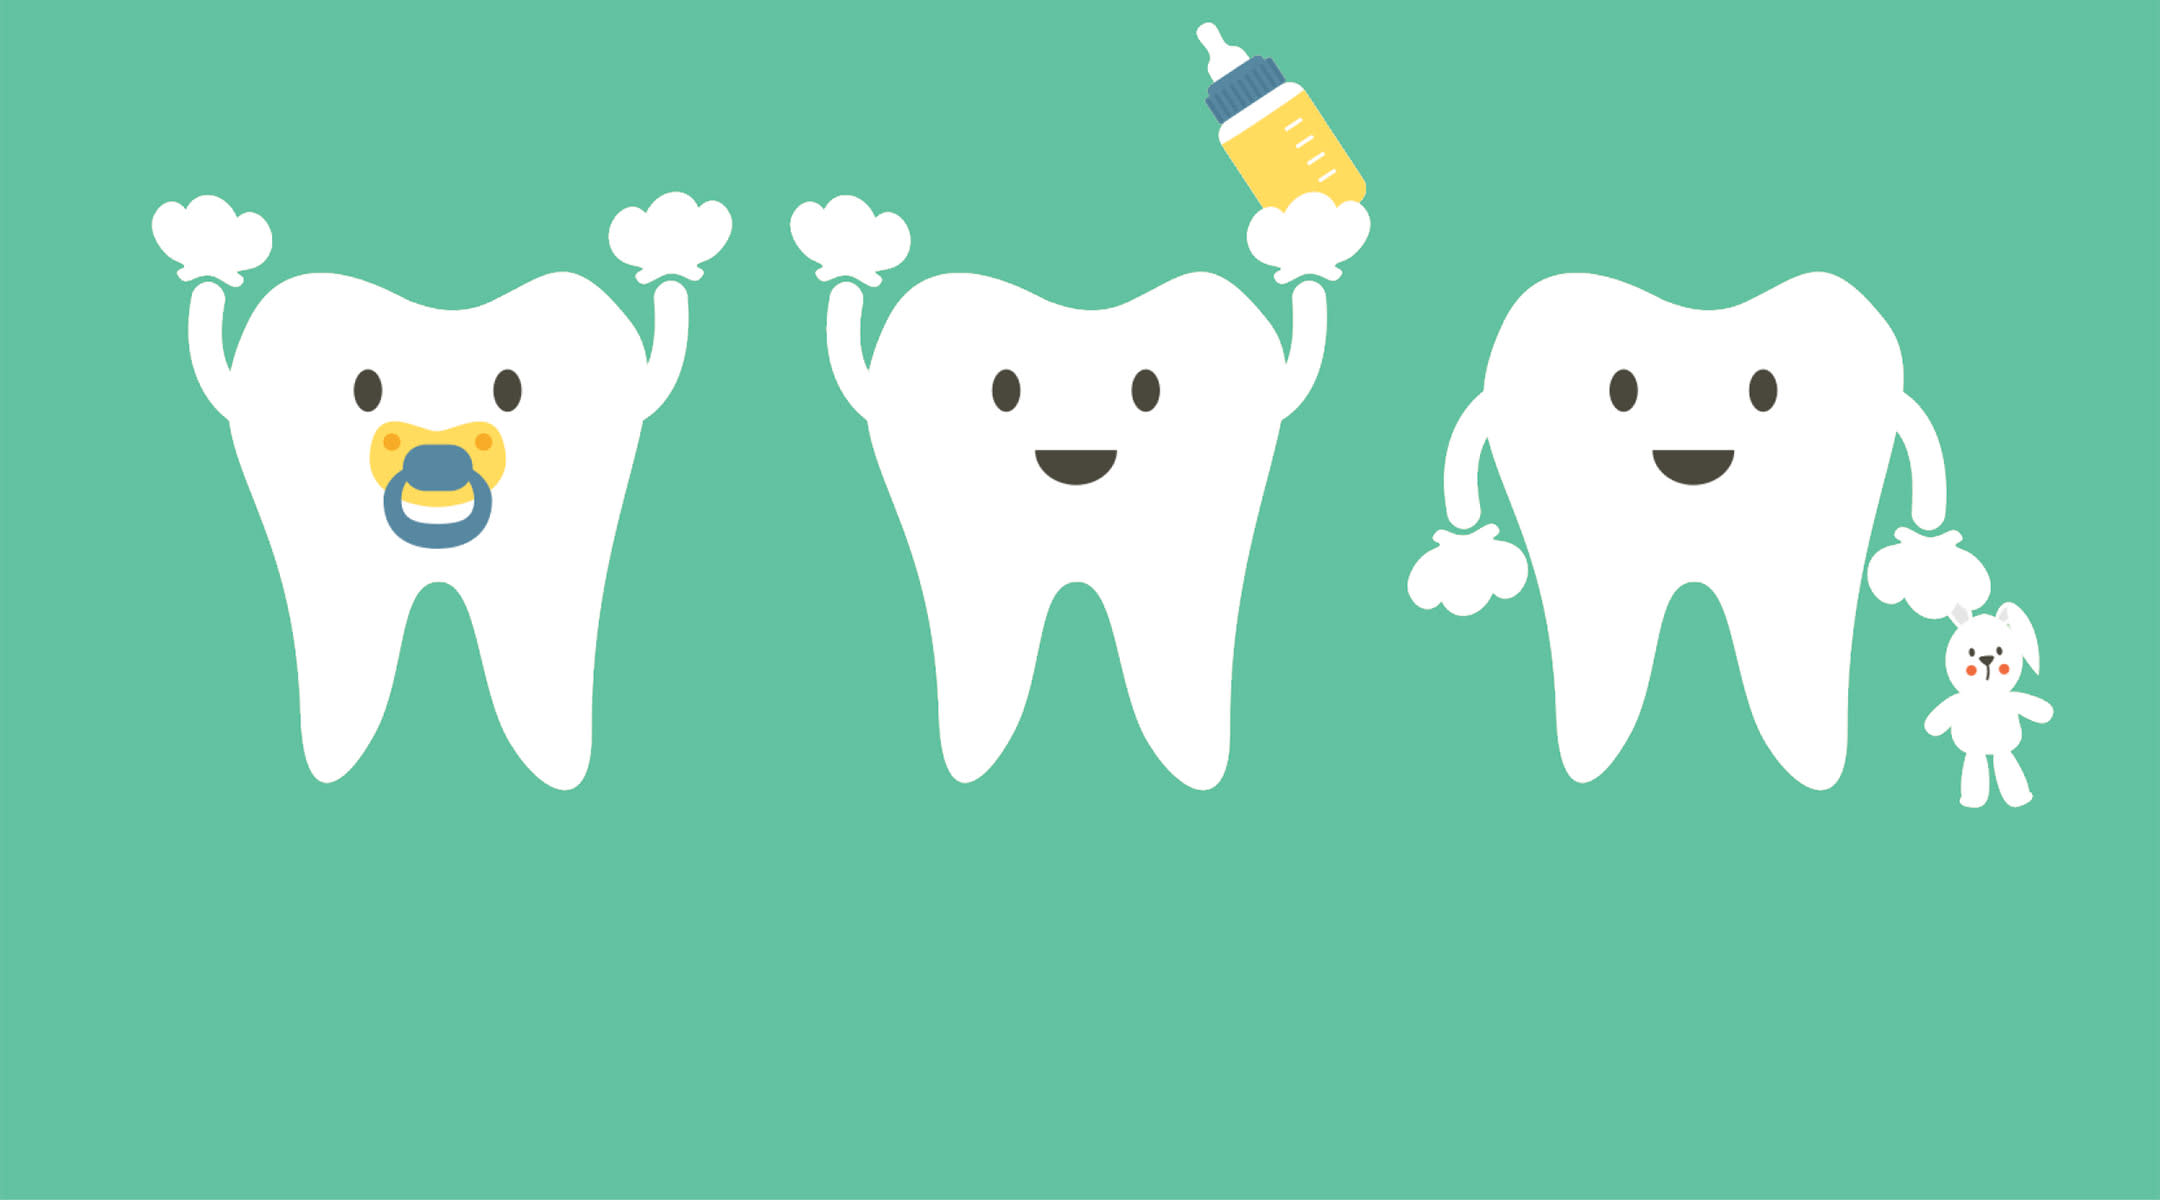 Baby Teeth Illustration